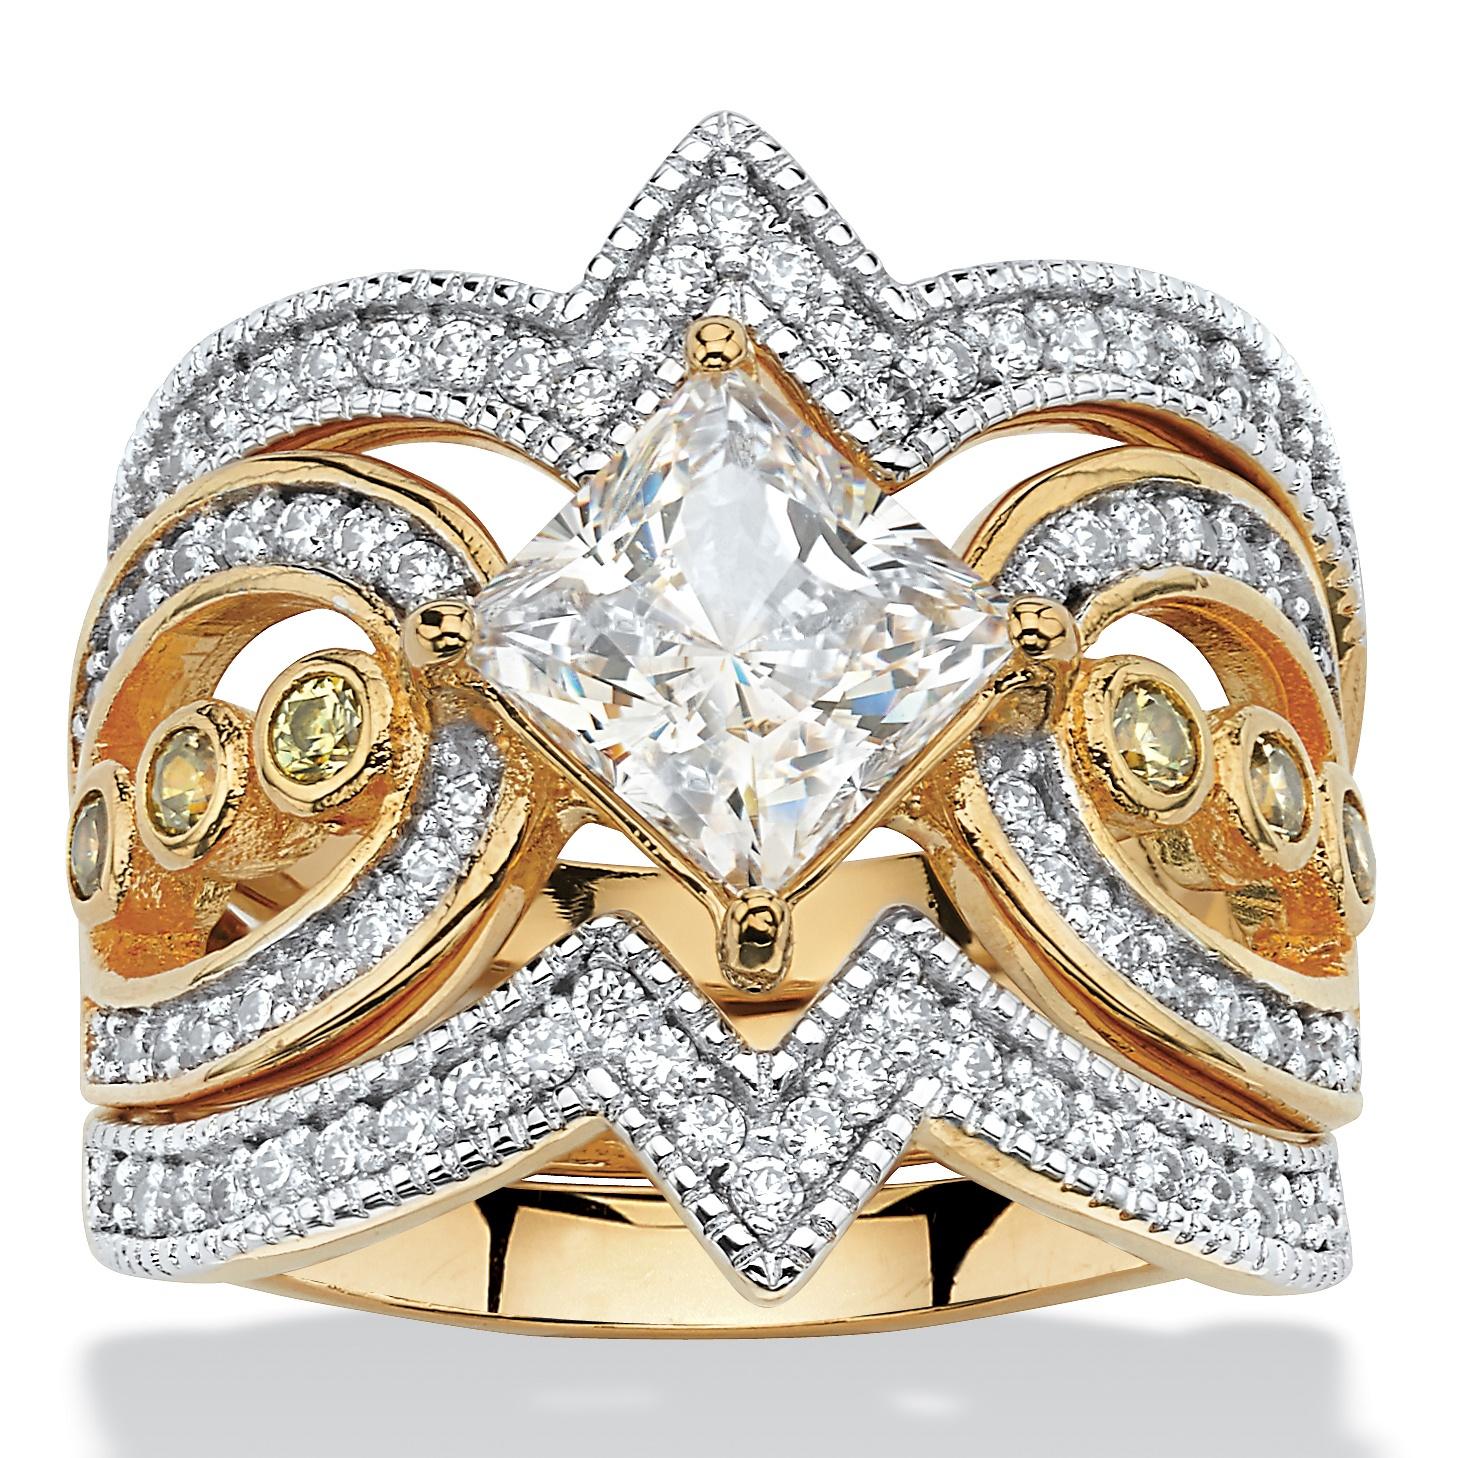 3 Piece 2.19 TCW Princess-Cut Cubic Zirconia Bridal Ring